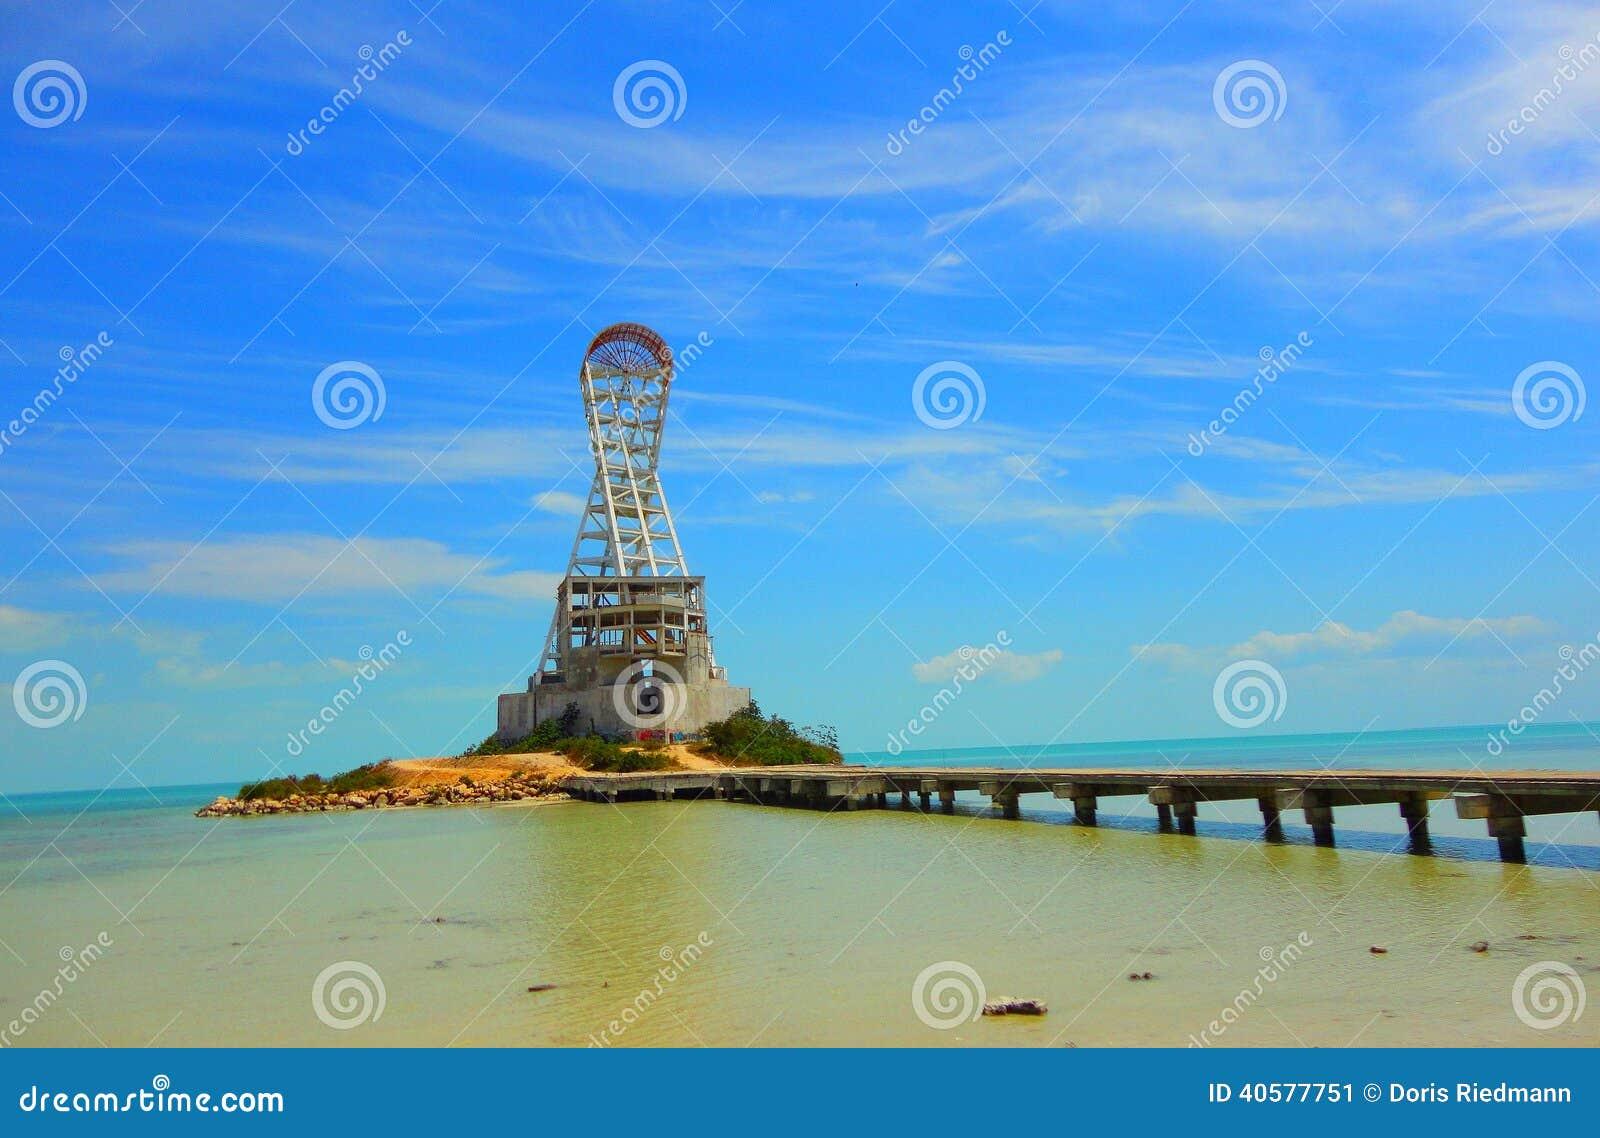 chetumal mexico beach summer lighthouse architecture